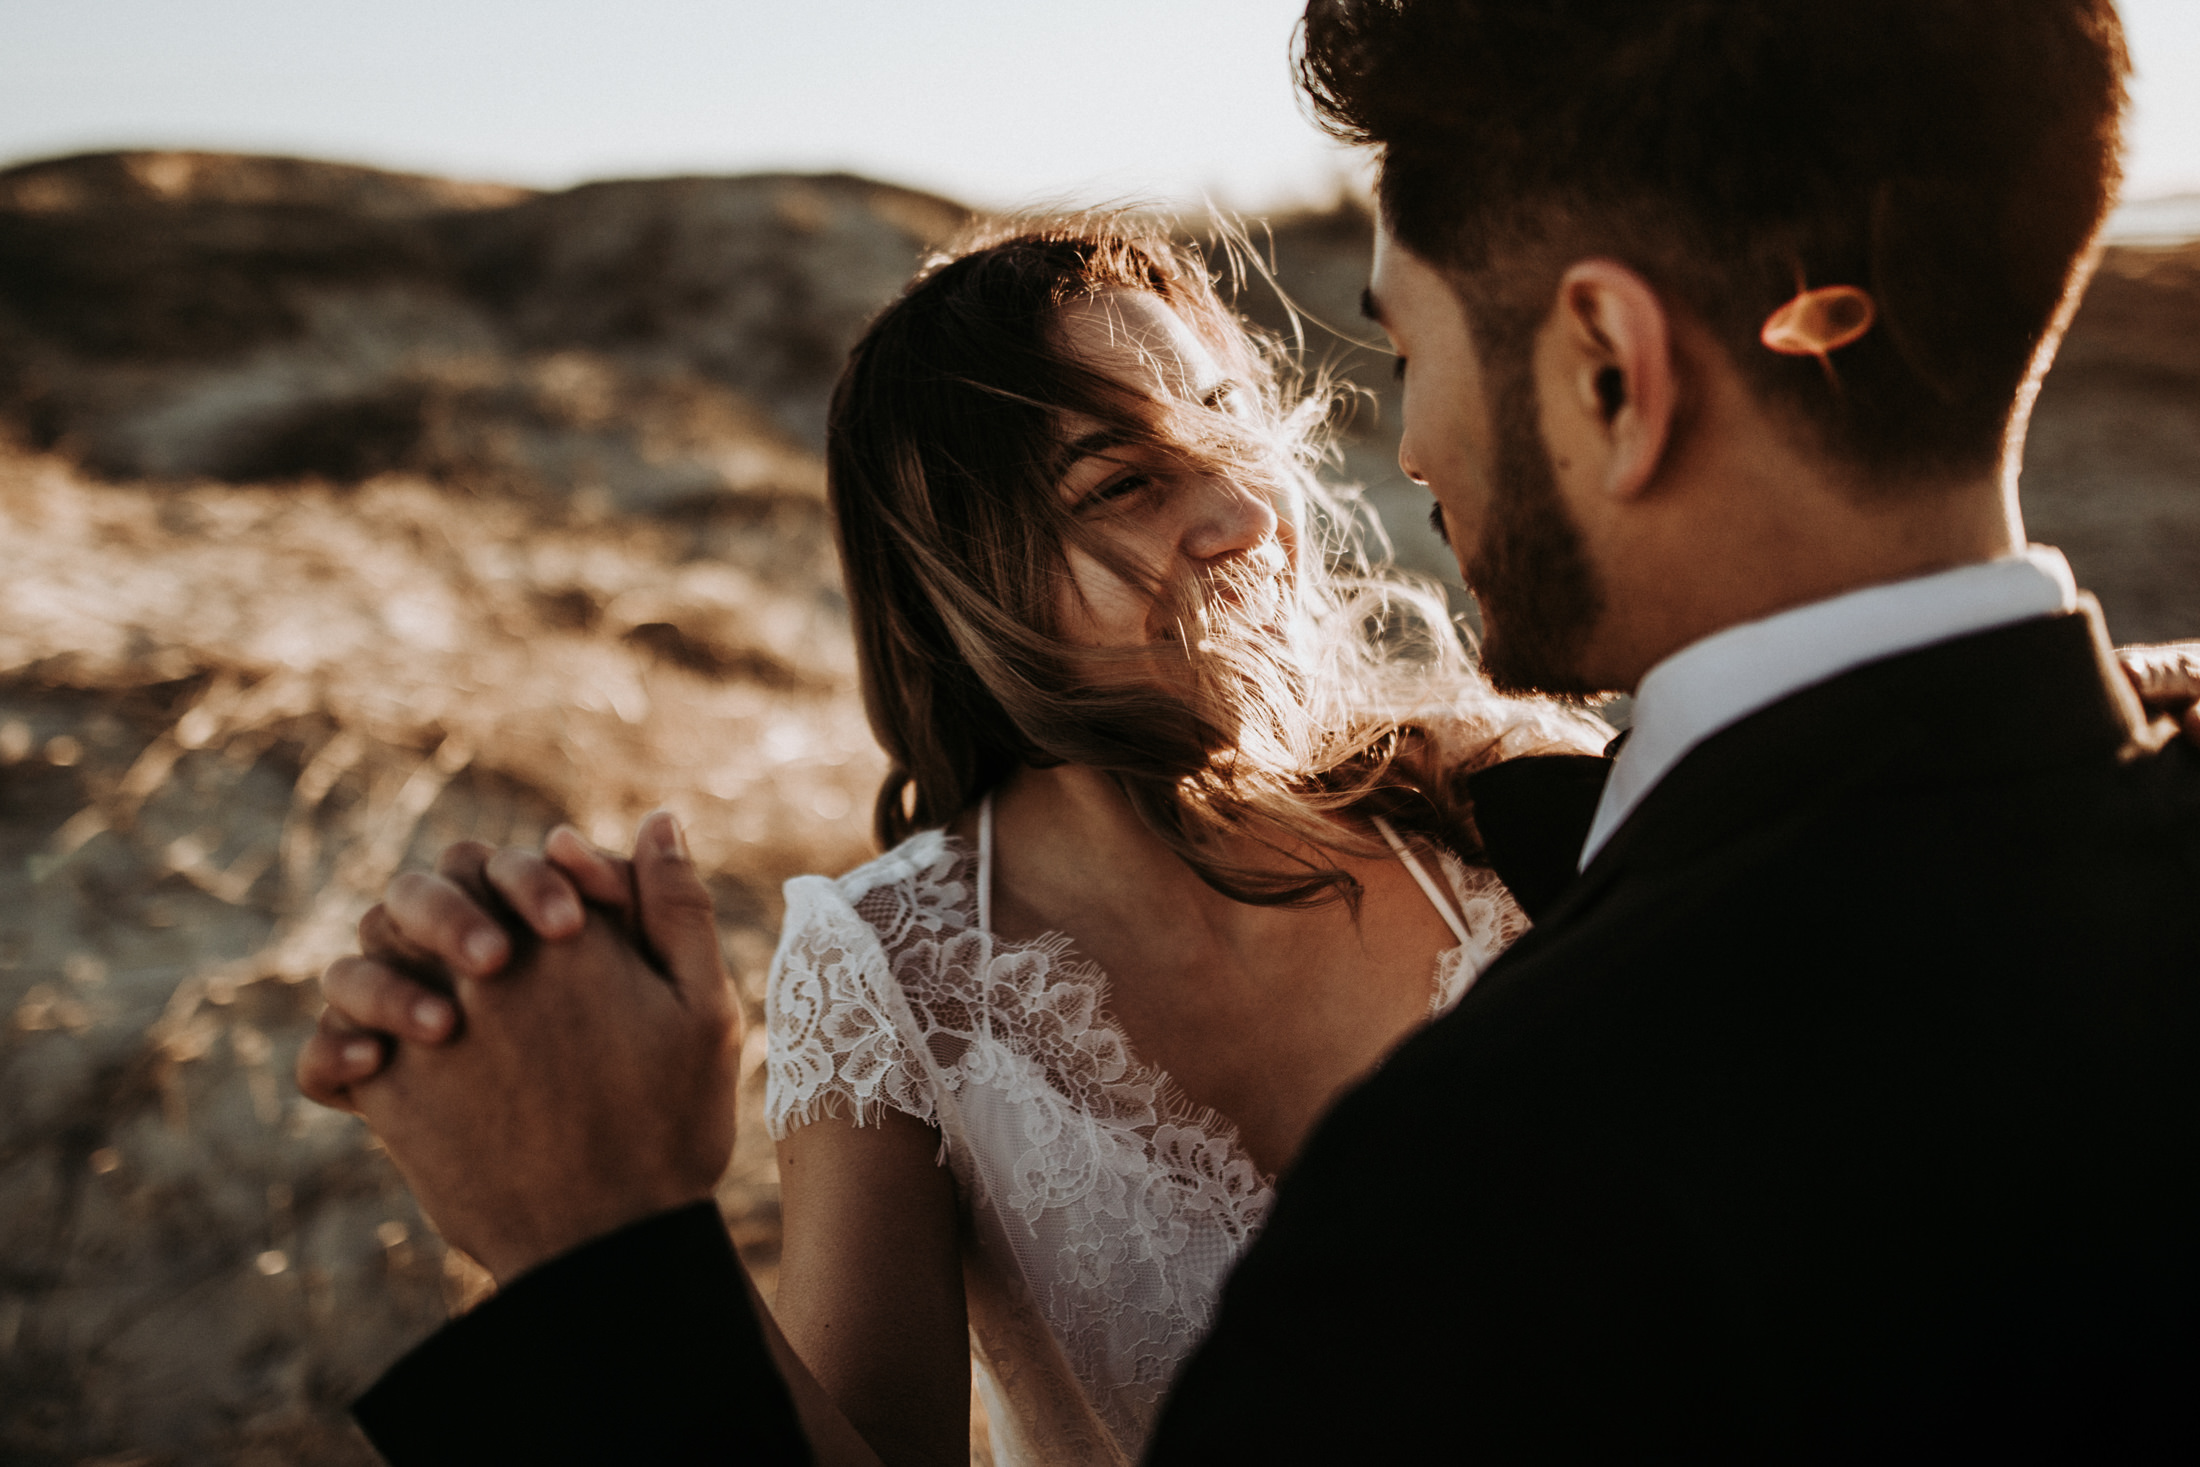 Wedding_Photographer_Mallorca_Daniela-Marquardt_Photography_CanaryIslands_Lanzarote_Iceland_Tuskany_Santorini_Portugal_Schweiz_Austria_Bayern_Elopement_Hochzeitsfotograf_Norddeichich_35